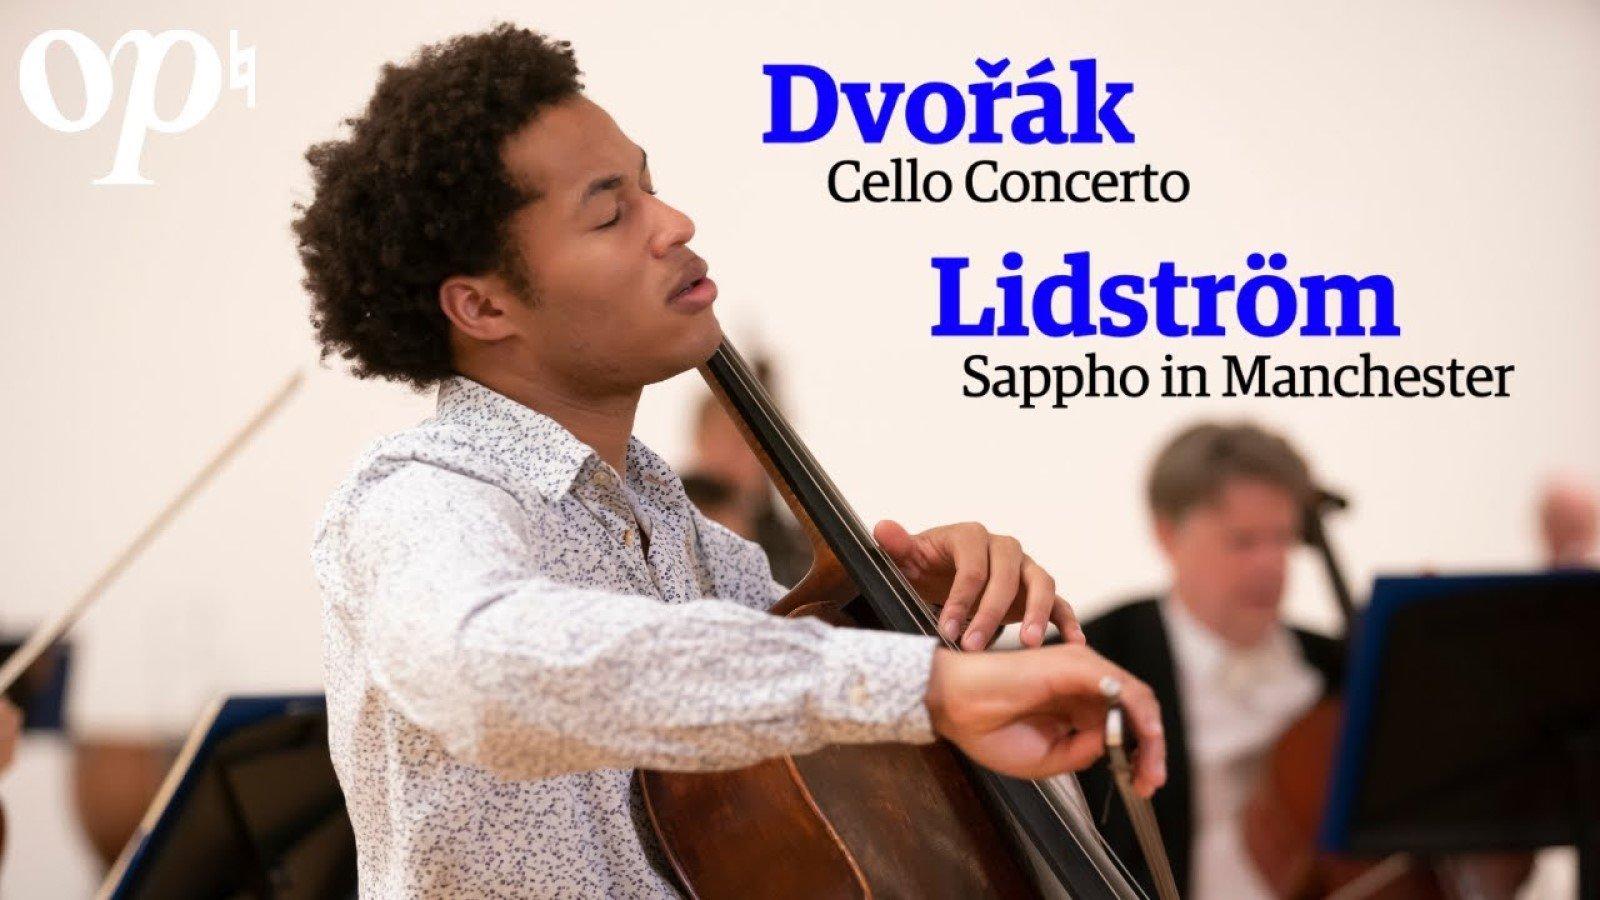 Sheku Kanneh-Mason performs Dvořák Cello Concerto